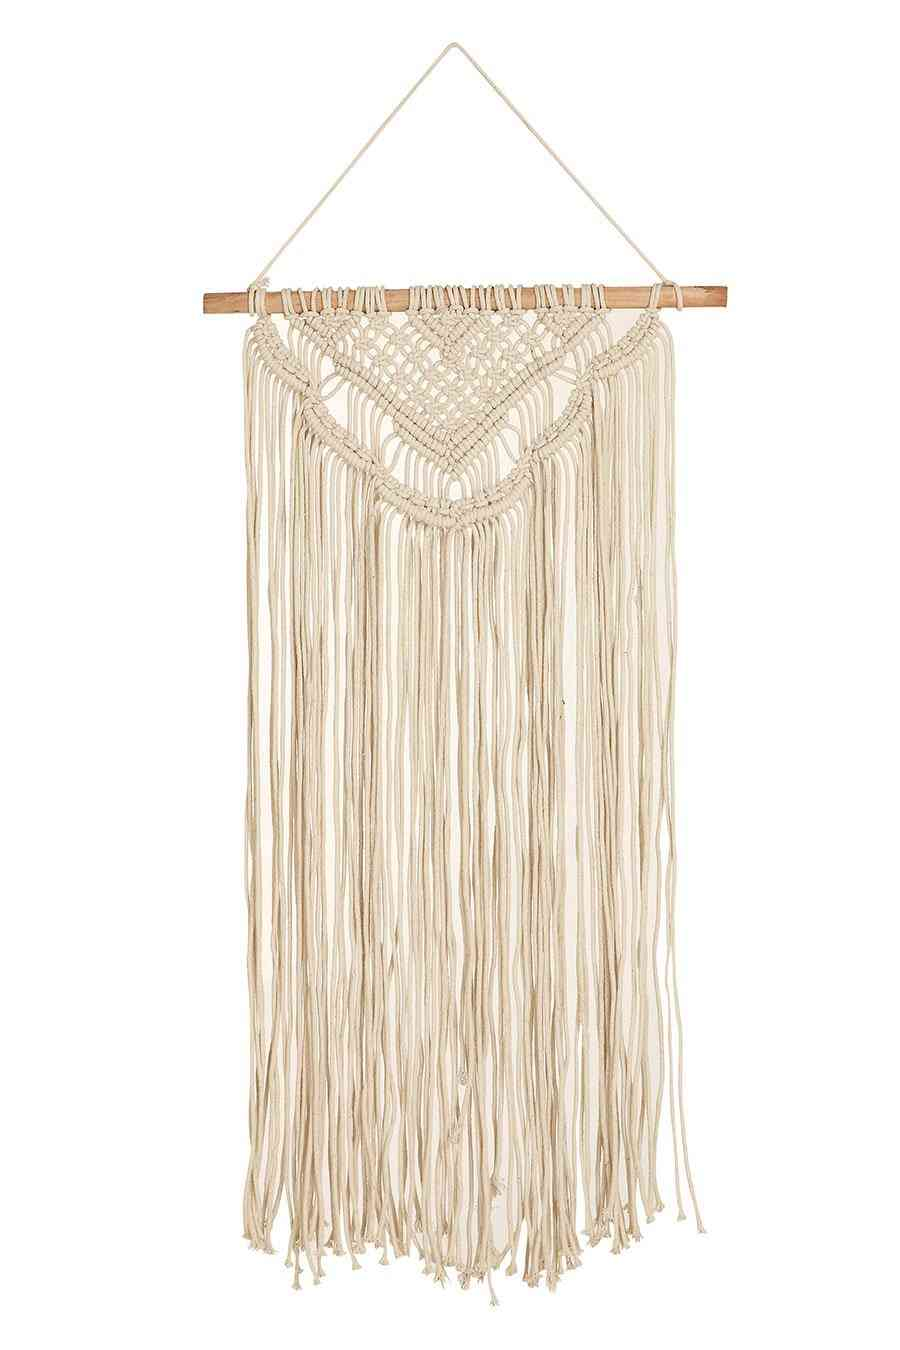 Handmade Macrame Modern Bohemian Style Tapestry